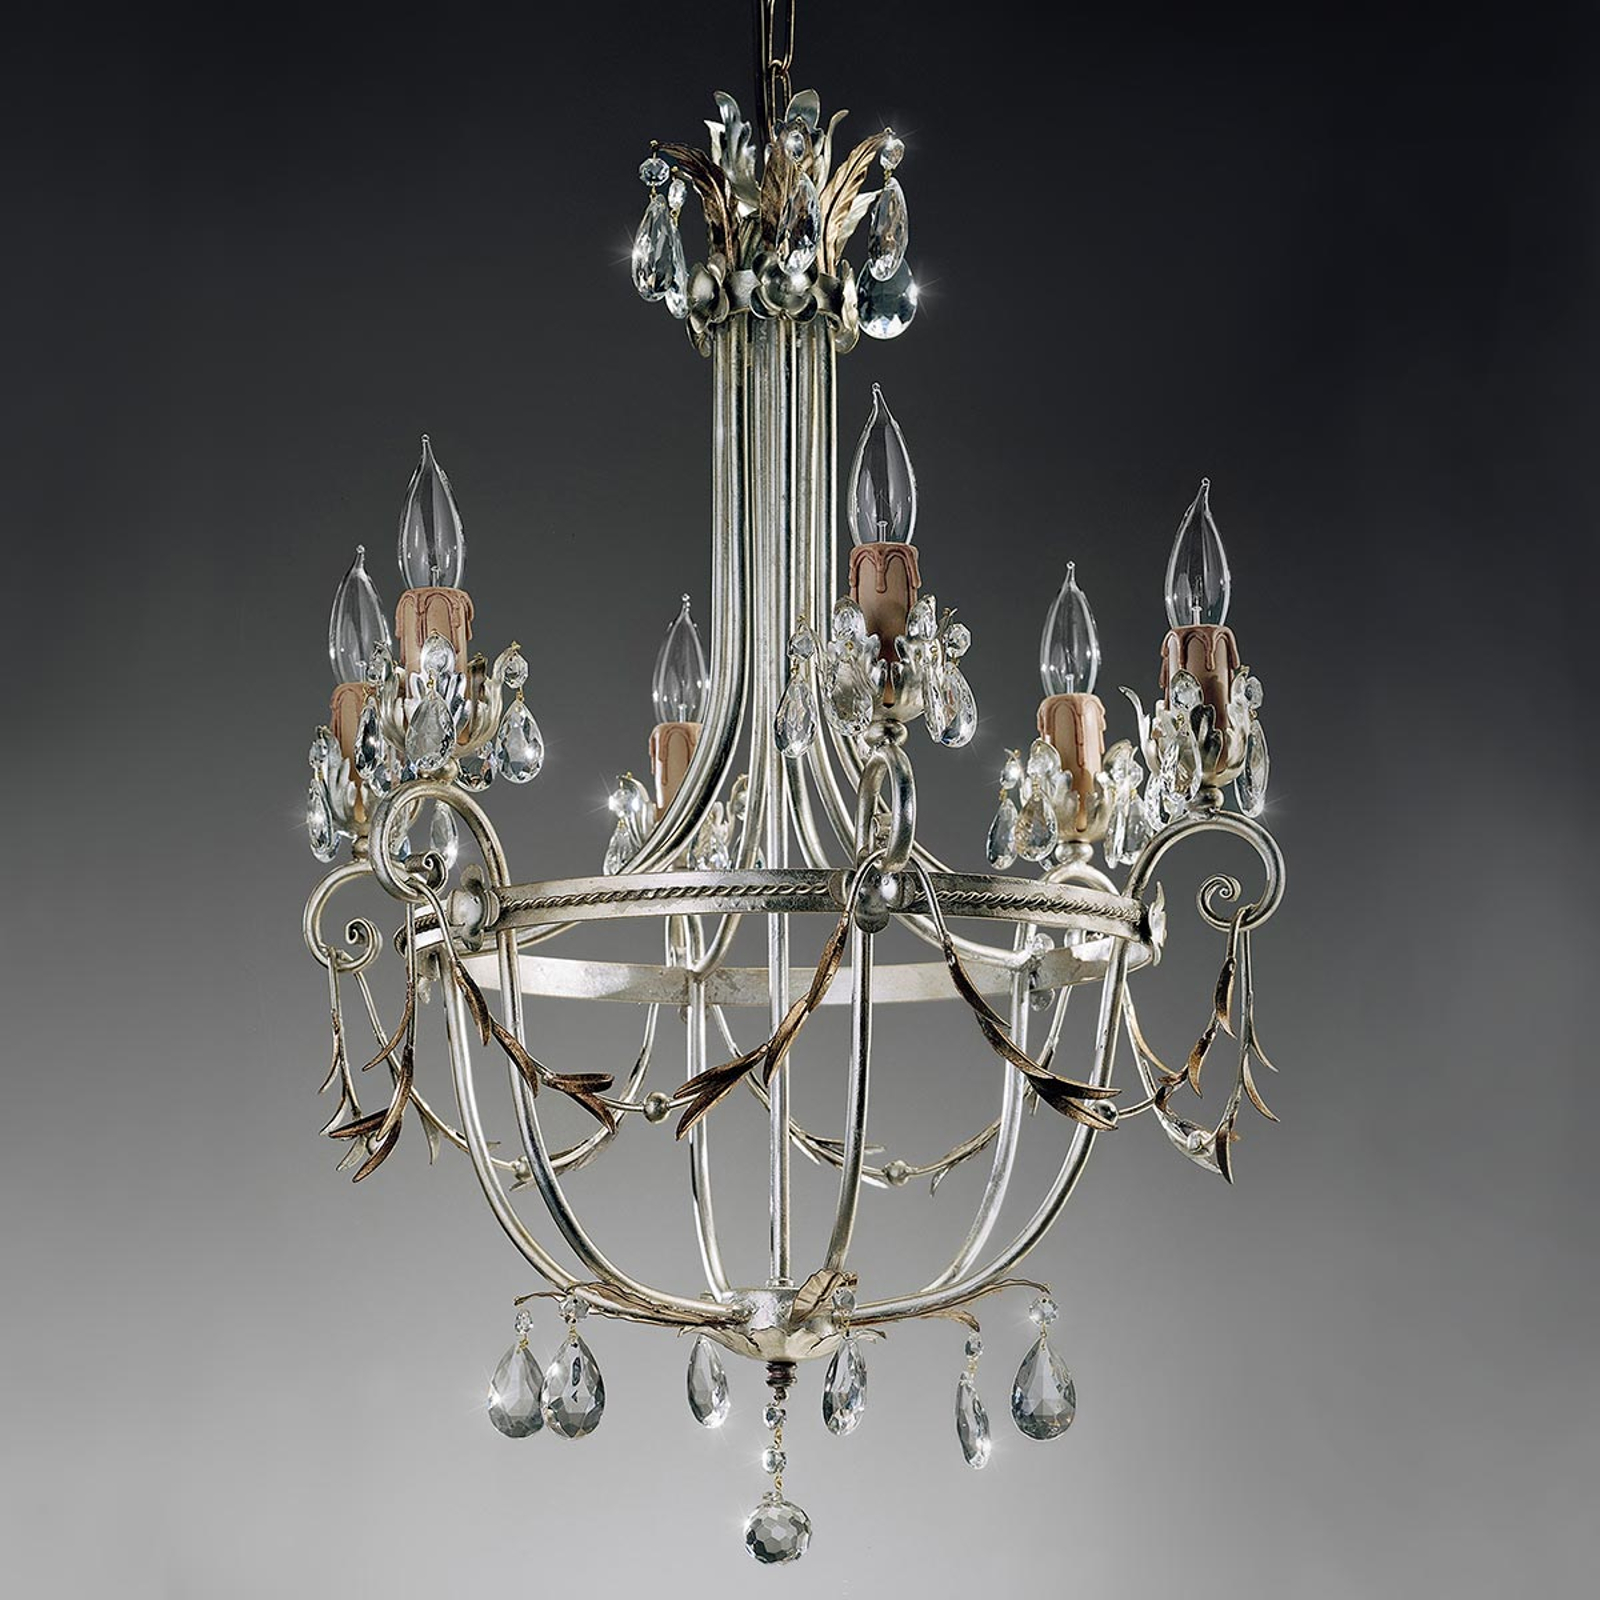 Florentinsk ljuskrona Mecca, 6 lampor